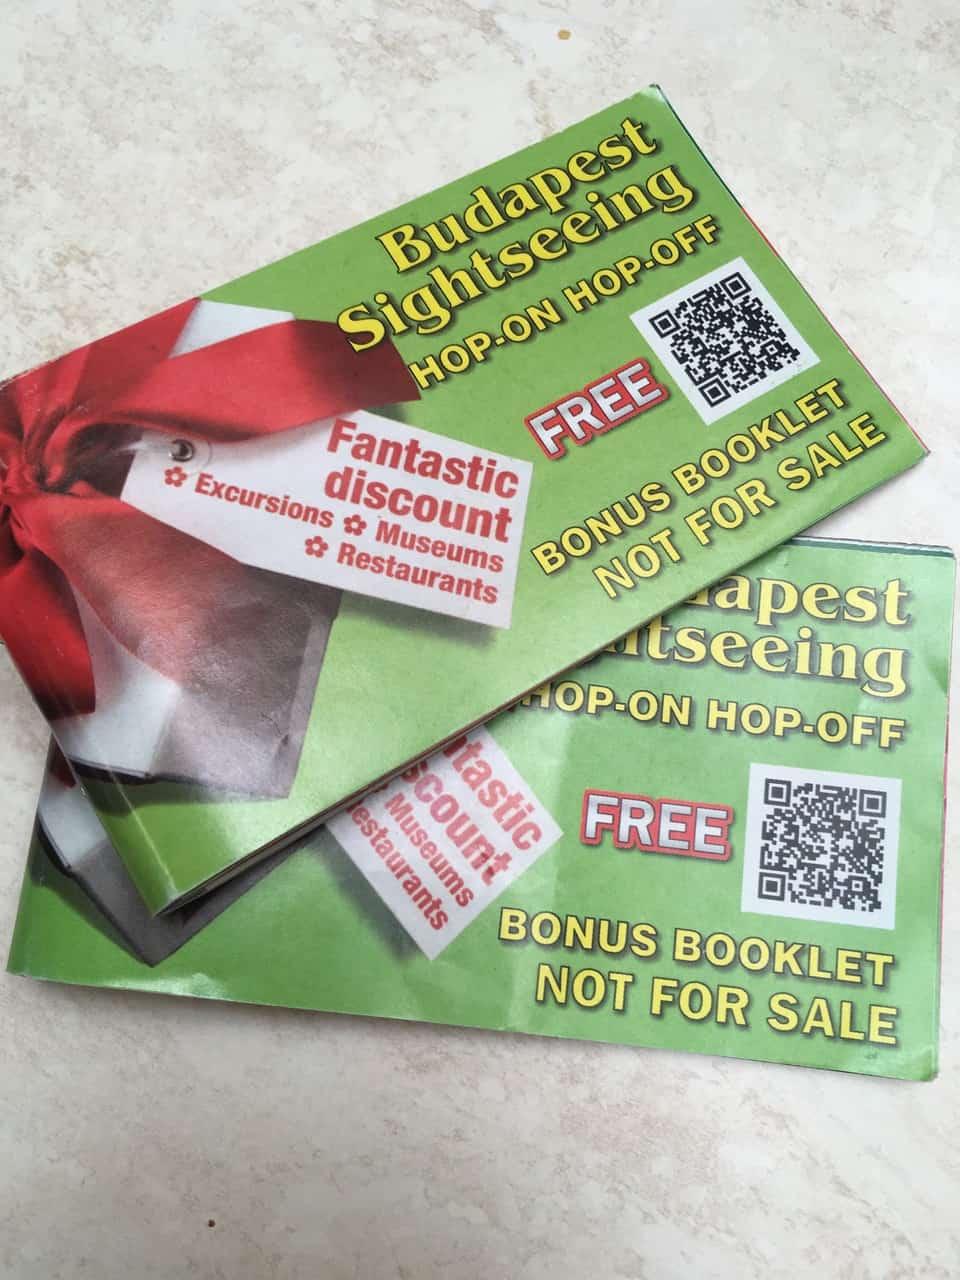 Hop-On Hop-Off Sightseeing Bonus Booklet